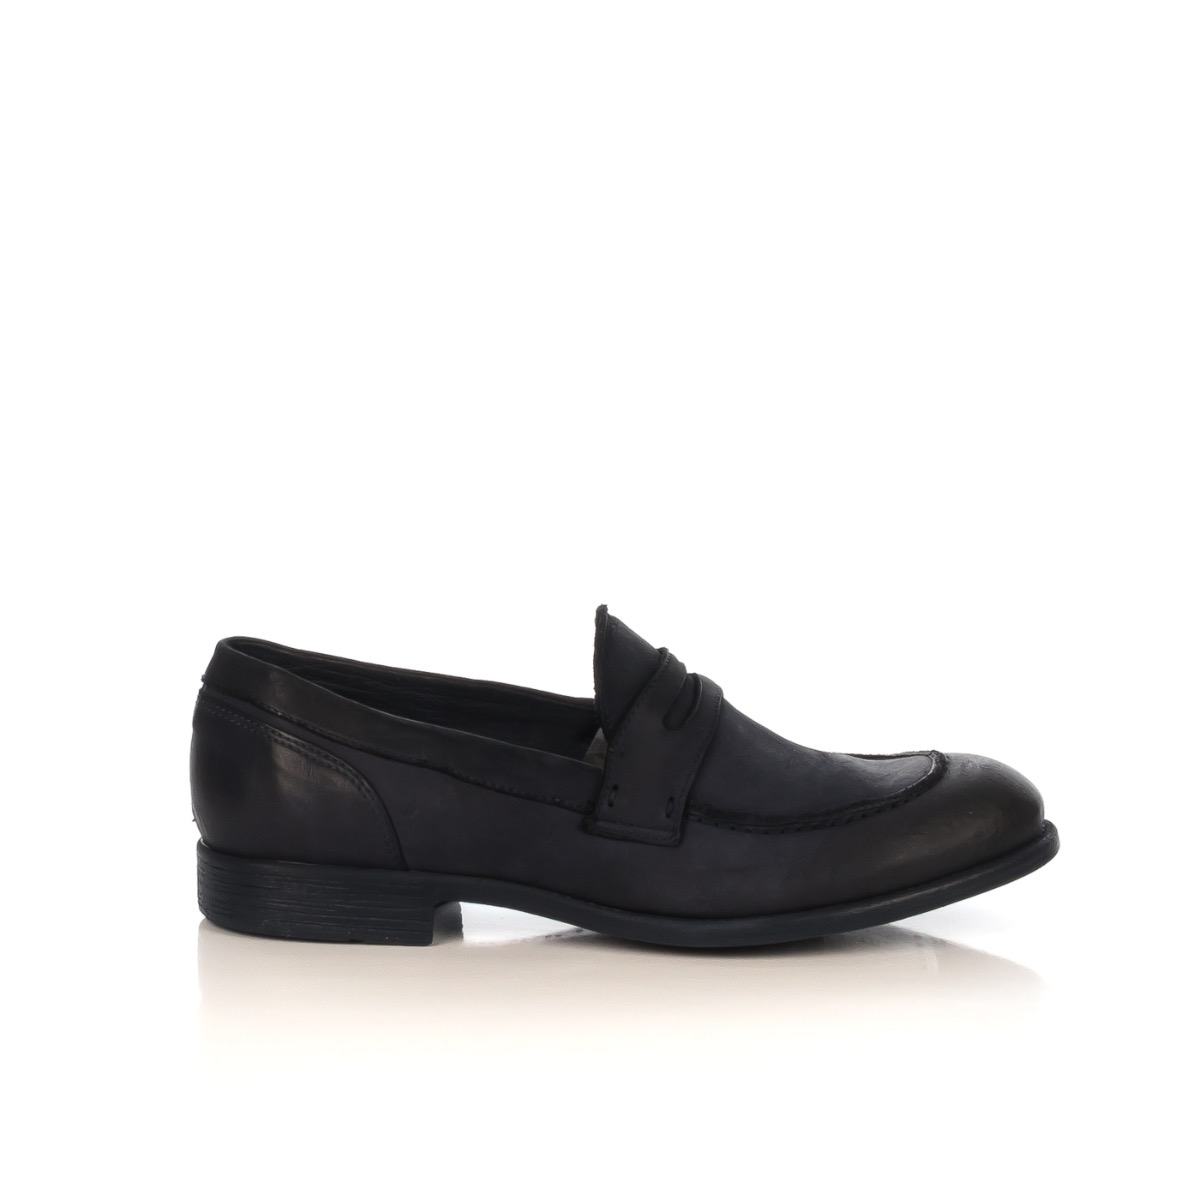 100 Pelle Uomo Blu Shoecenter Mocassino Neri M39401 Hundred 8vnmNO0w